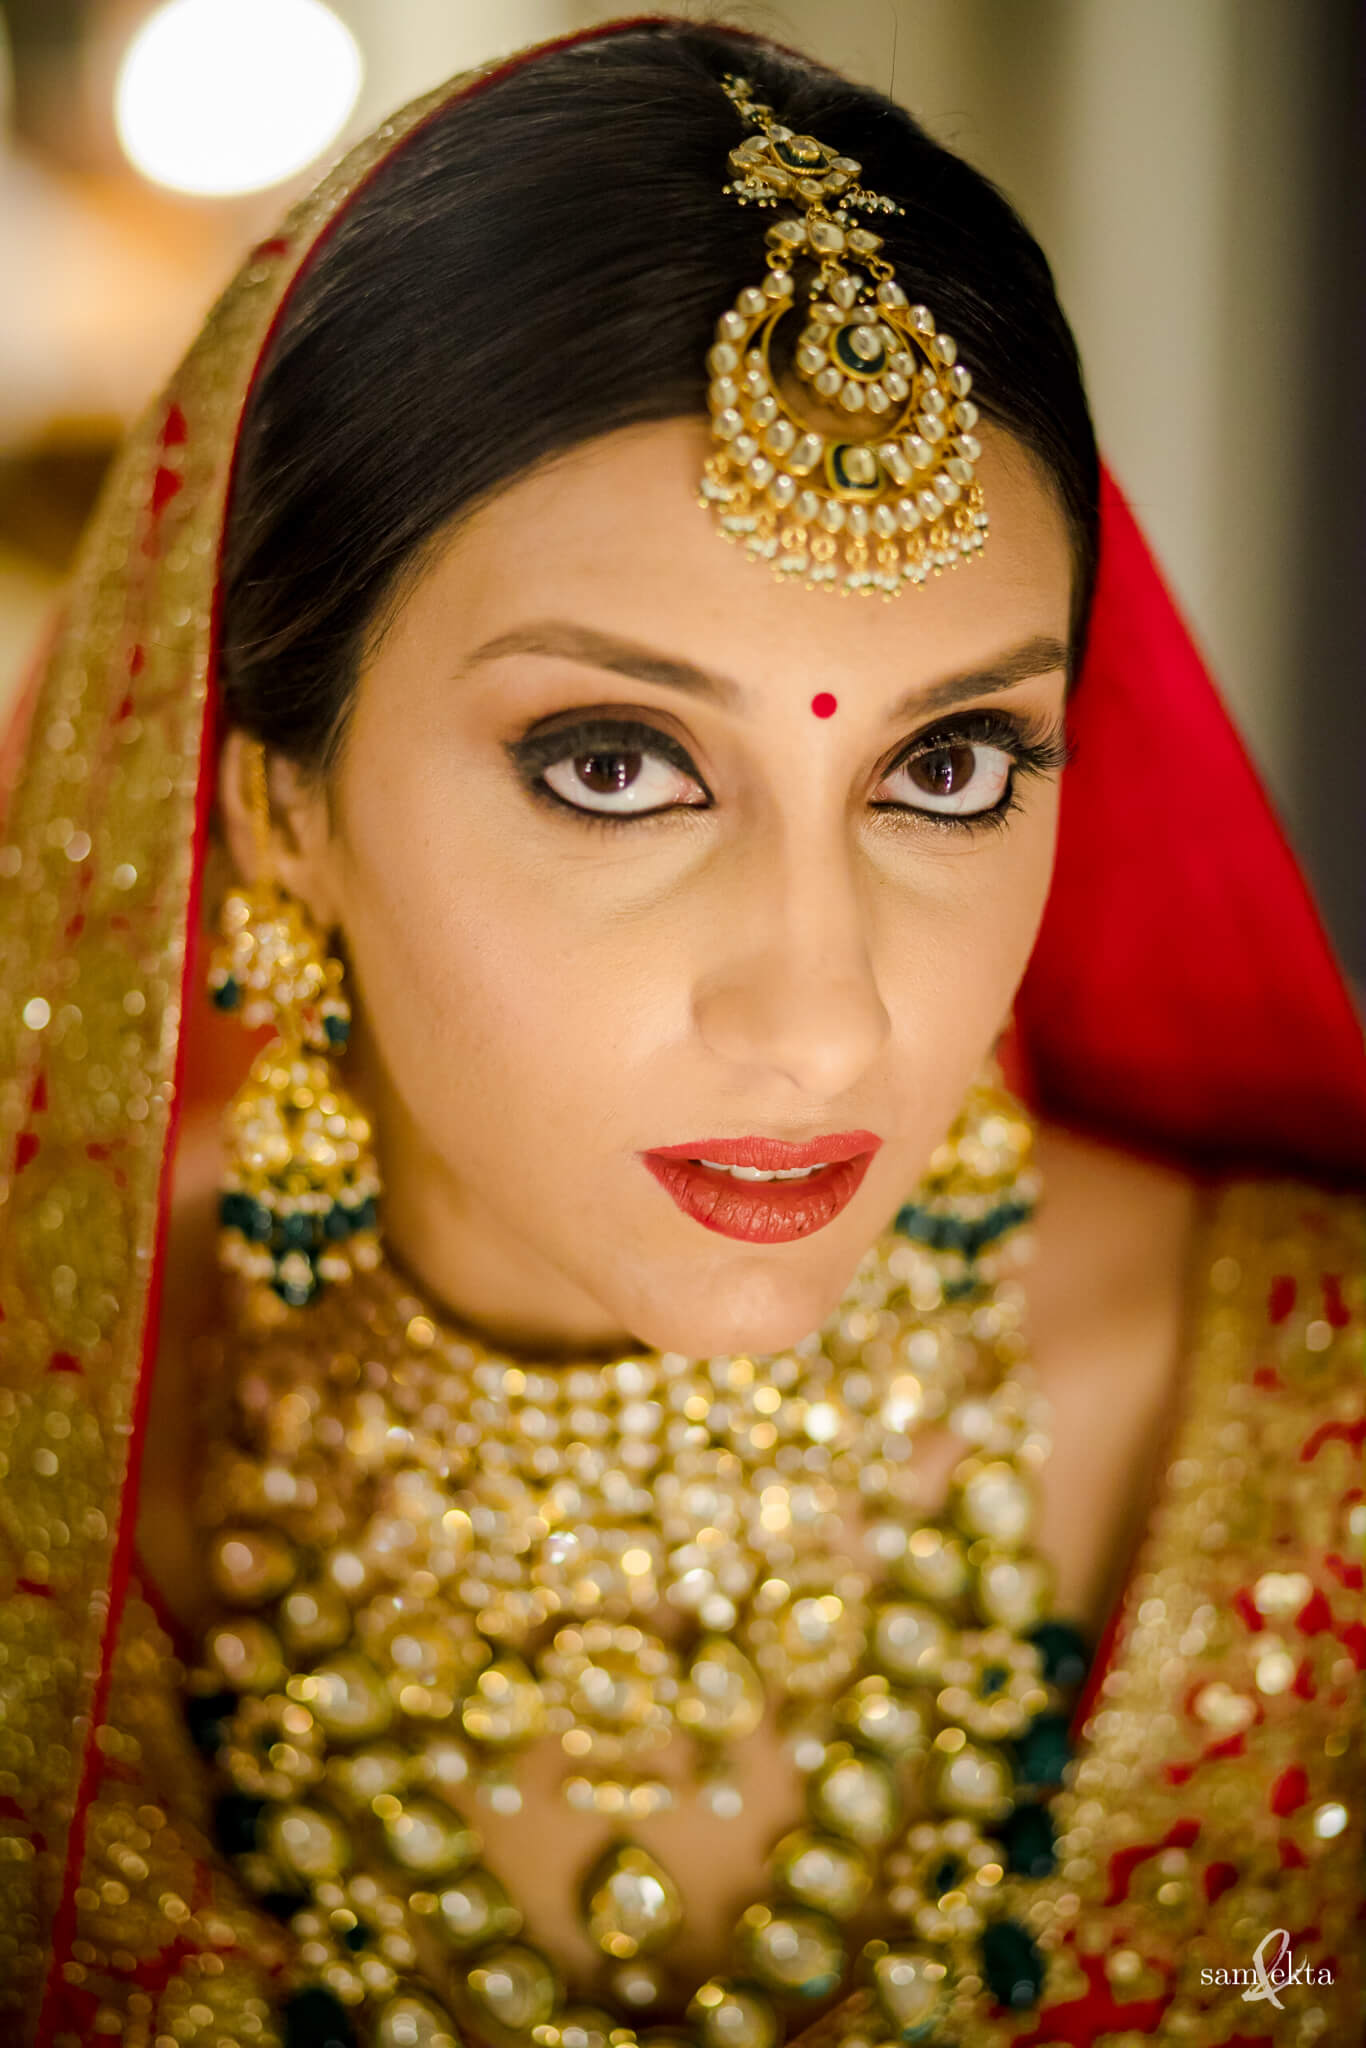 Armaan Jain And Anissa Malhotra's Wedding